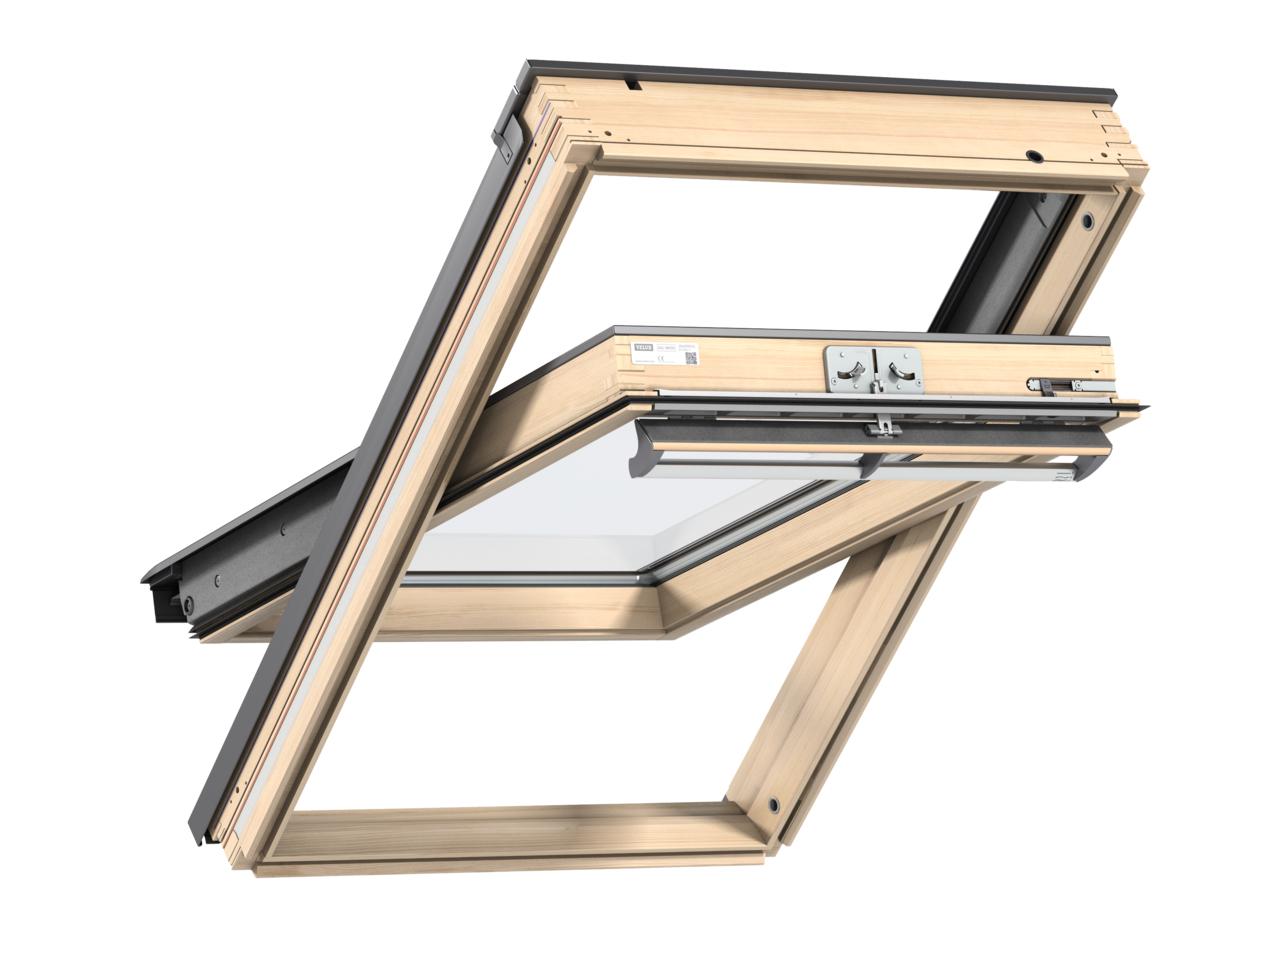 Velux GGL SK06 1140 x 1180mm Centre Pivot Standard 70Pane Roof Window - Pine